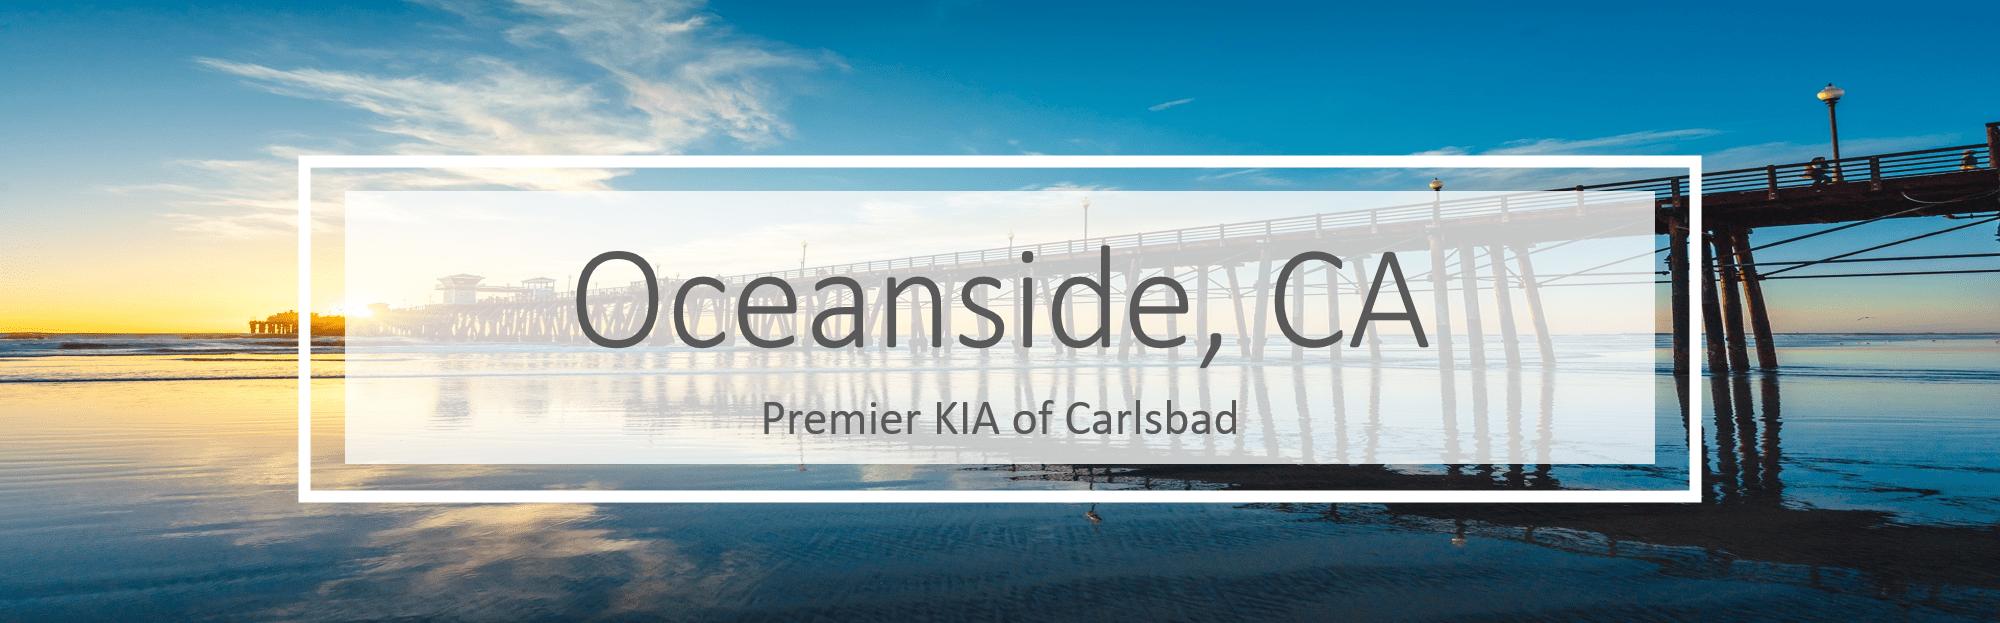 Serving Oceanside, CA